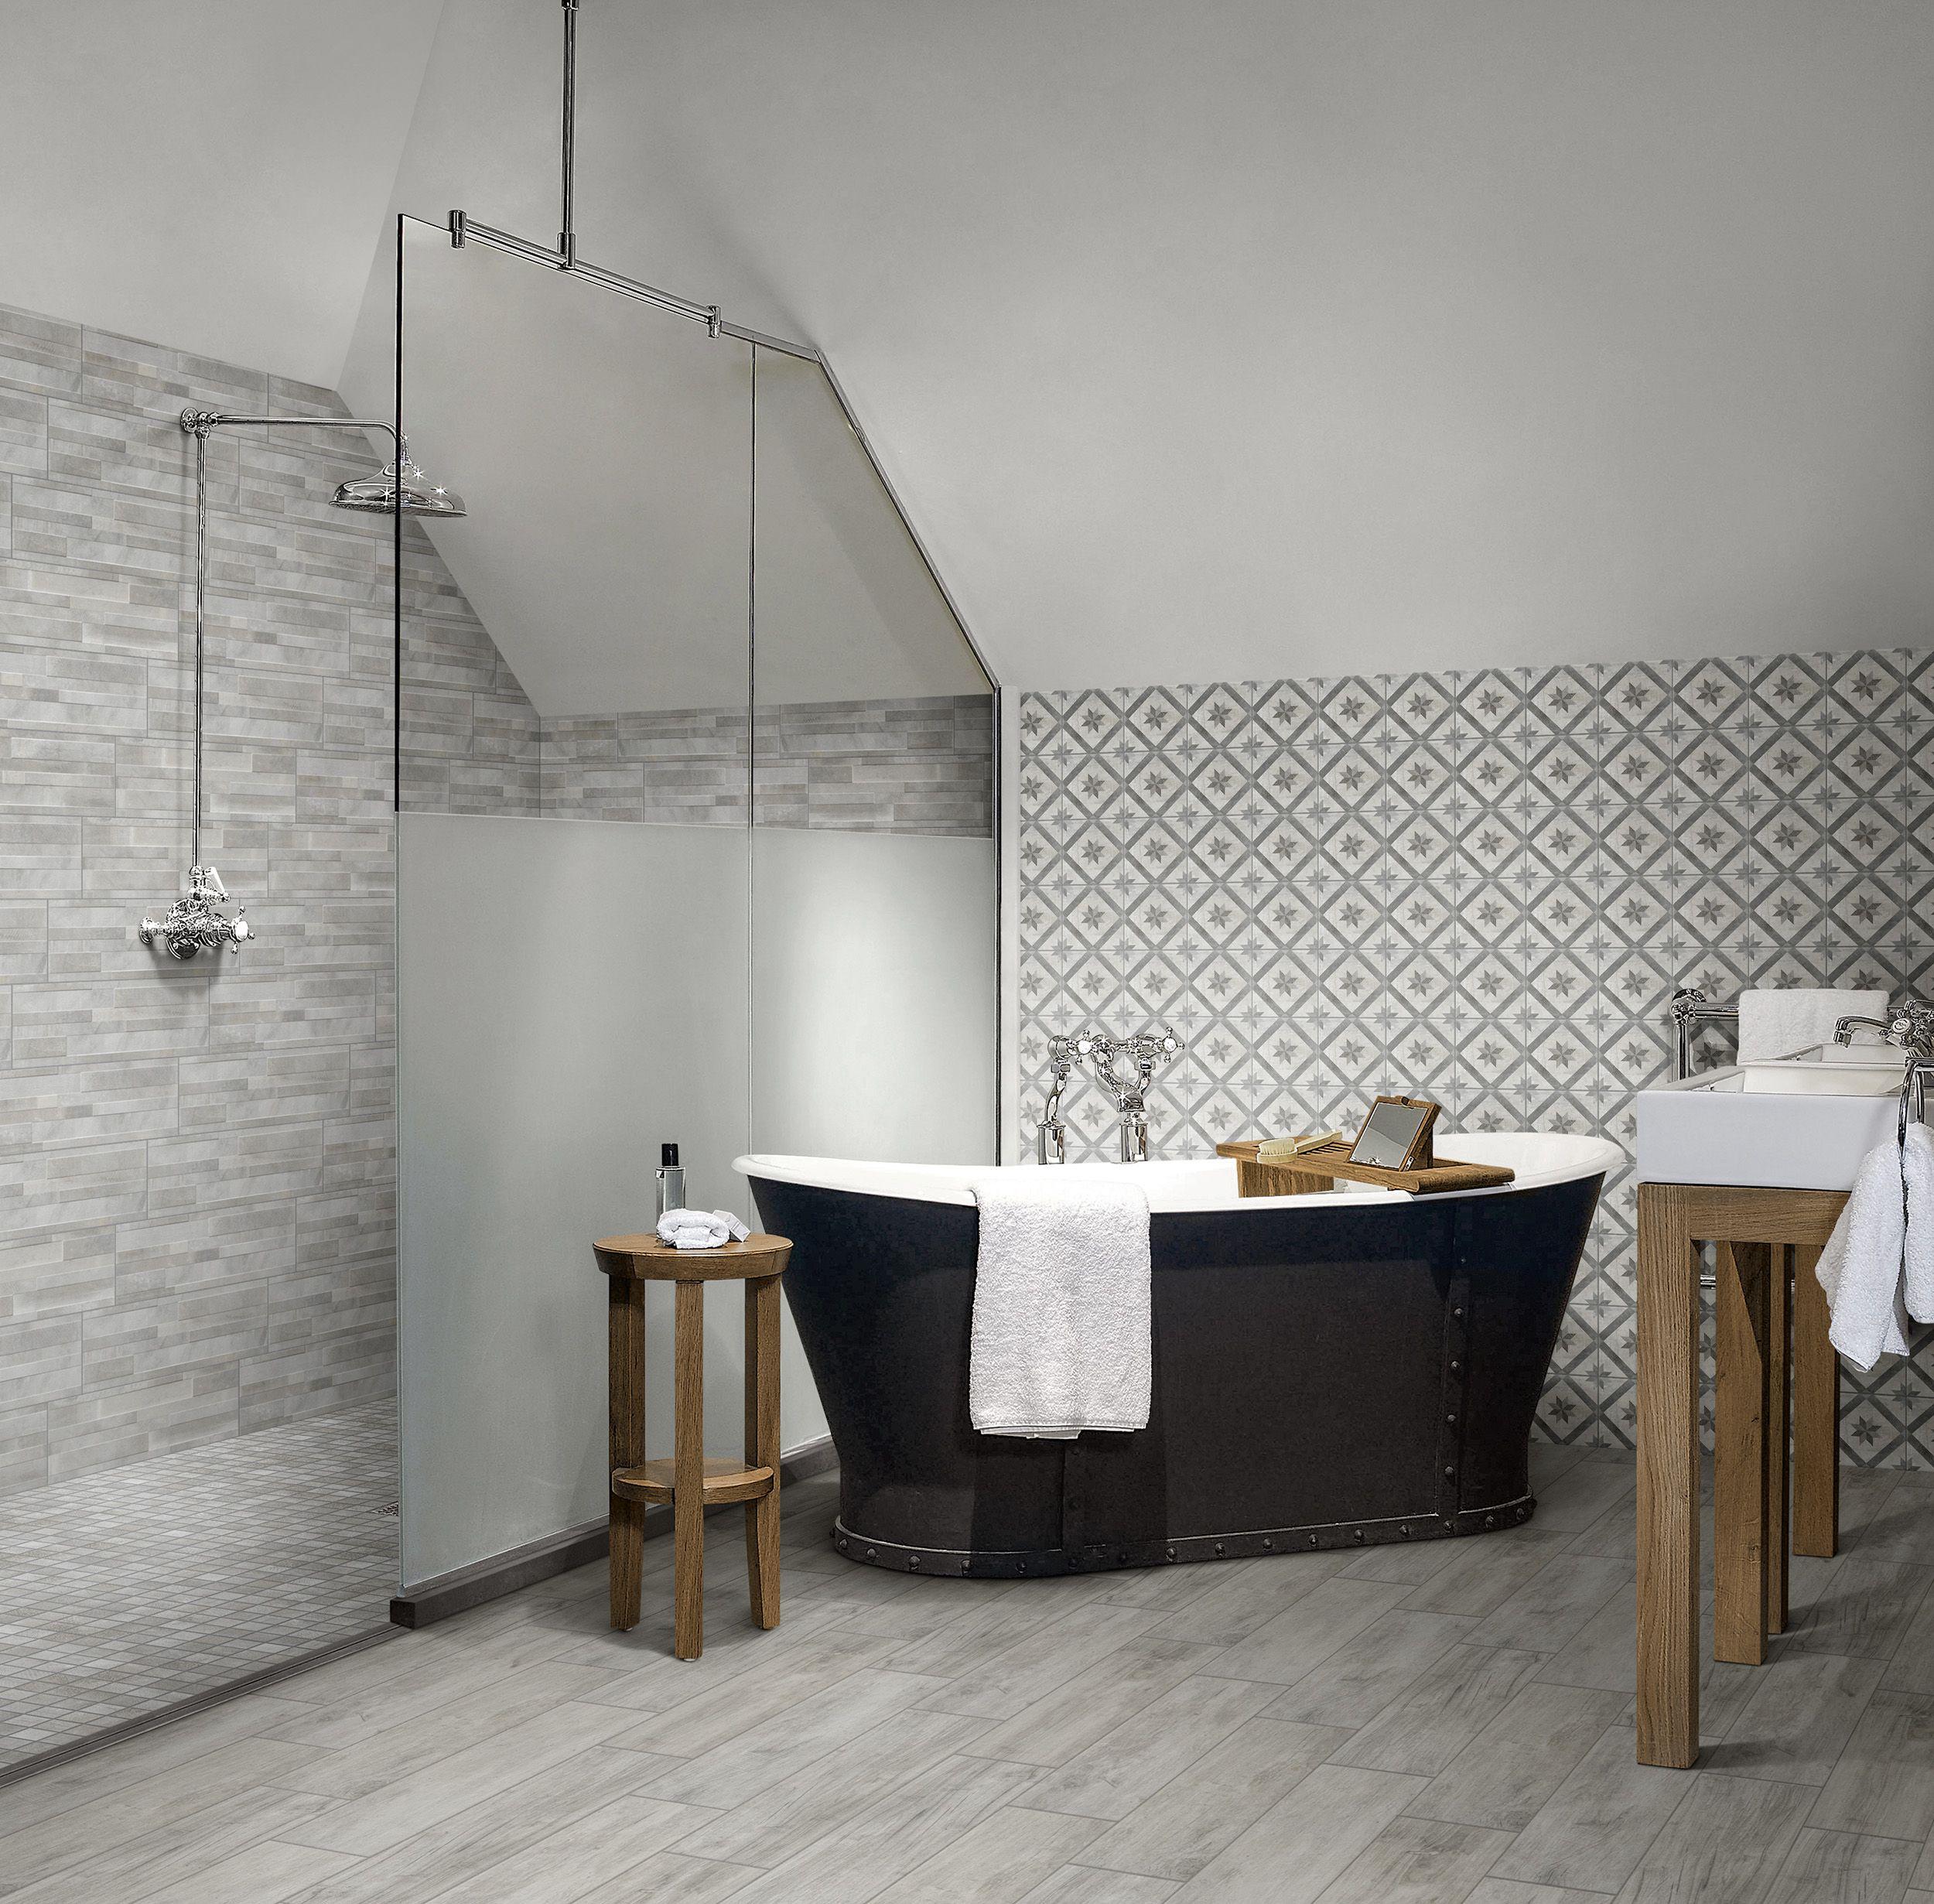 Cemento White Deco Bathroom Tiles Bathtub